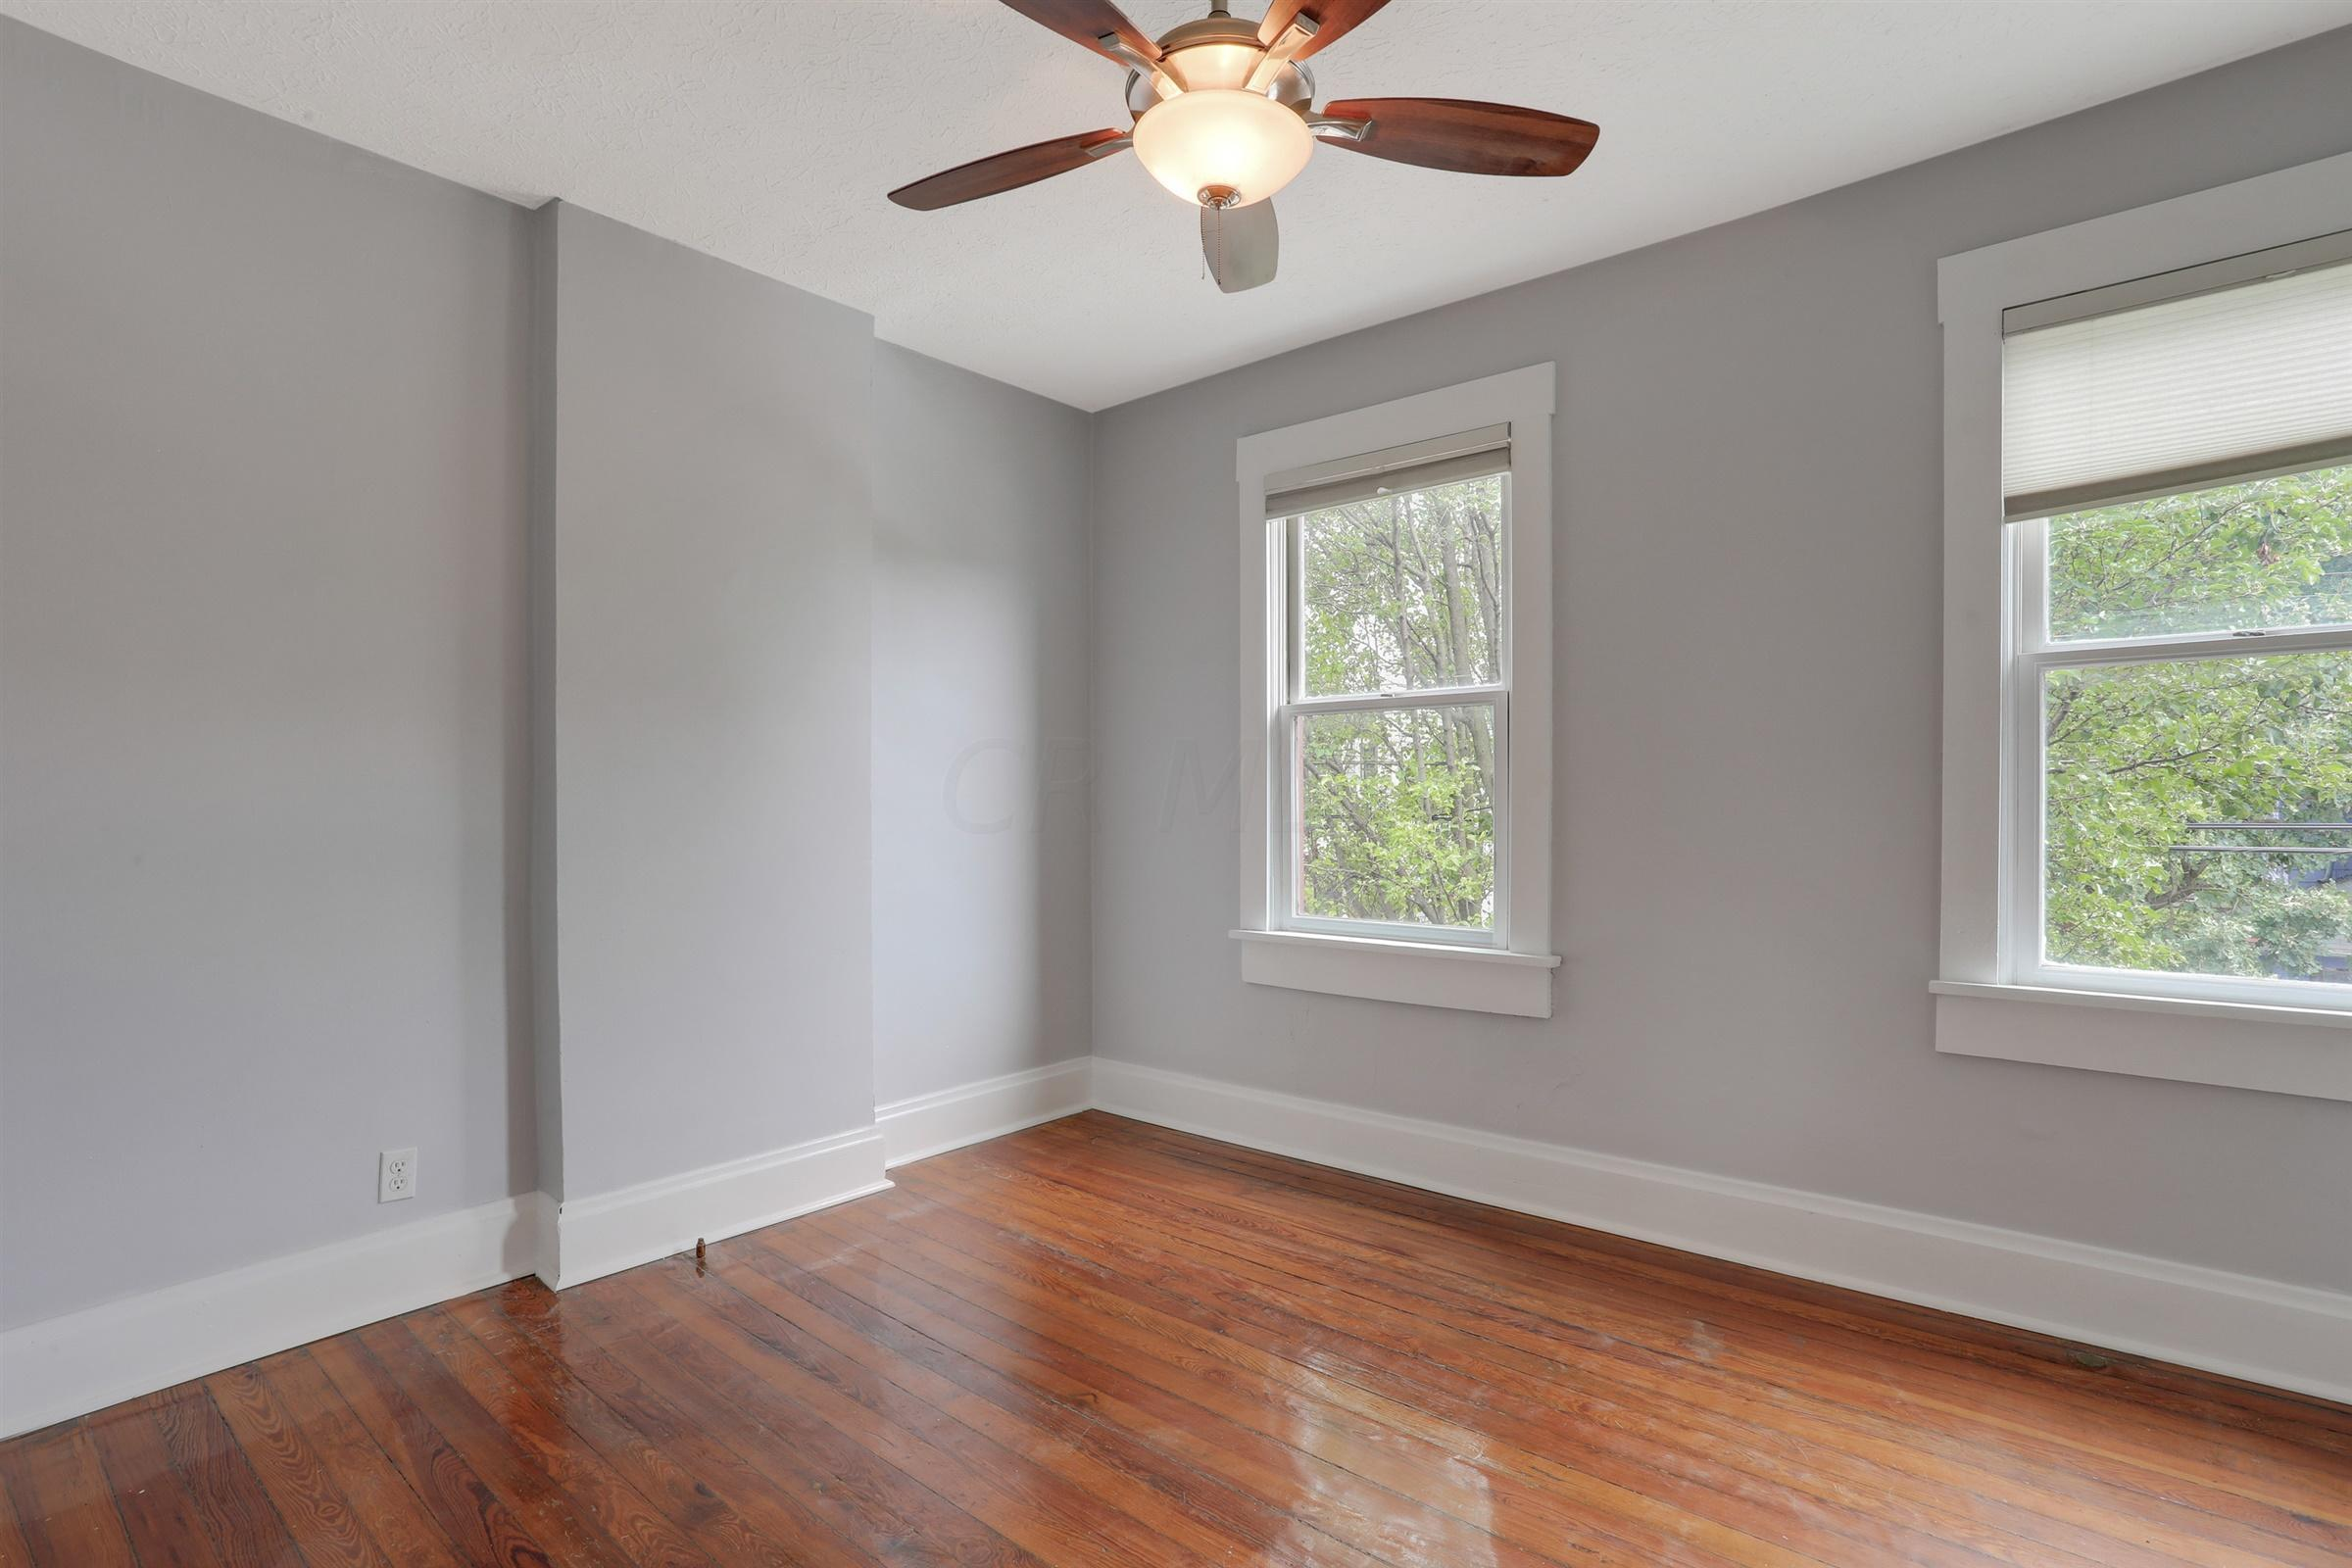 151 Detroit Avenue, Columbus, Ohio 43201, 2 Bedrooms Bedrooms, ,1 BathroomBathrooms,Residential,For Sale,Detroit,220025665